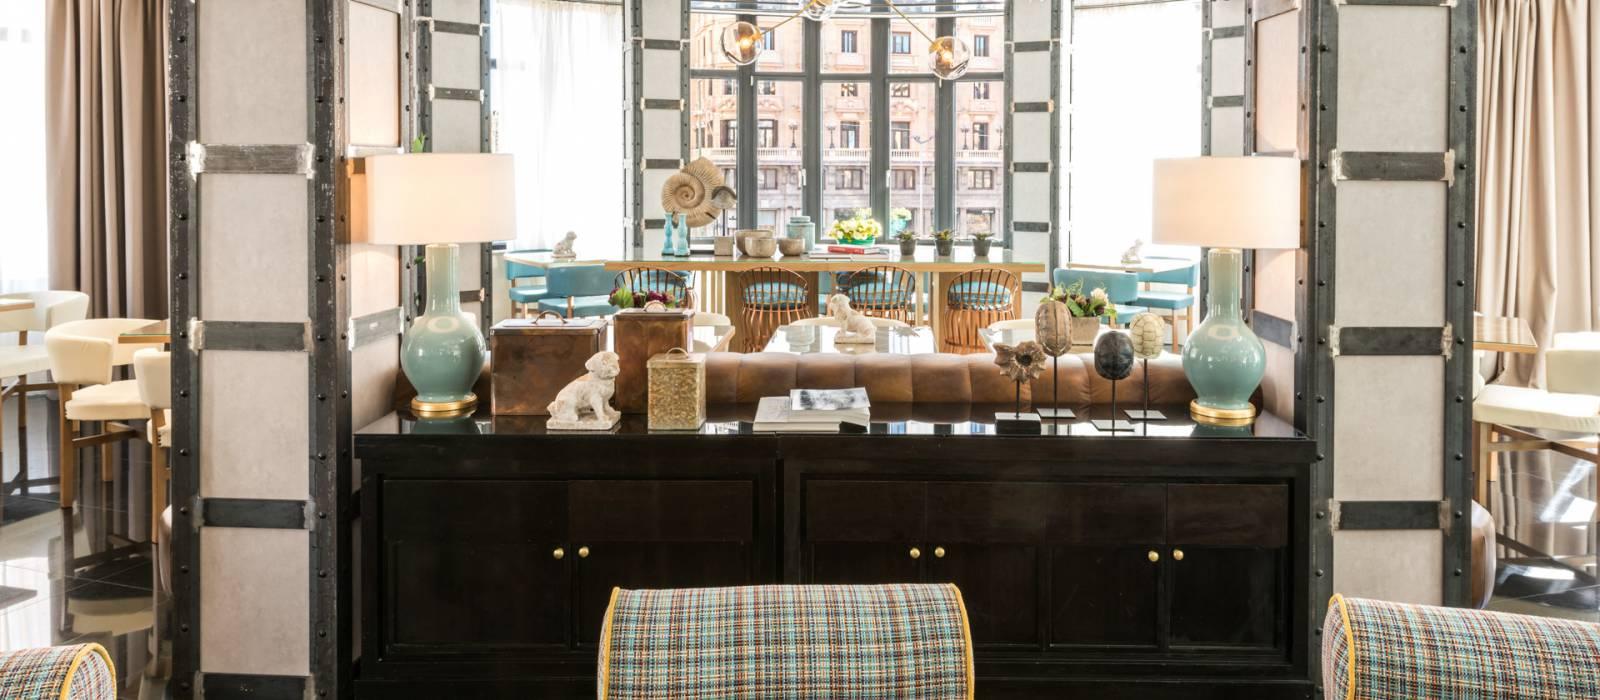 Servizi Capitol Hotel Madrid - Vincci Hoteles - Reims Bar